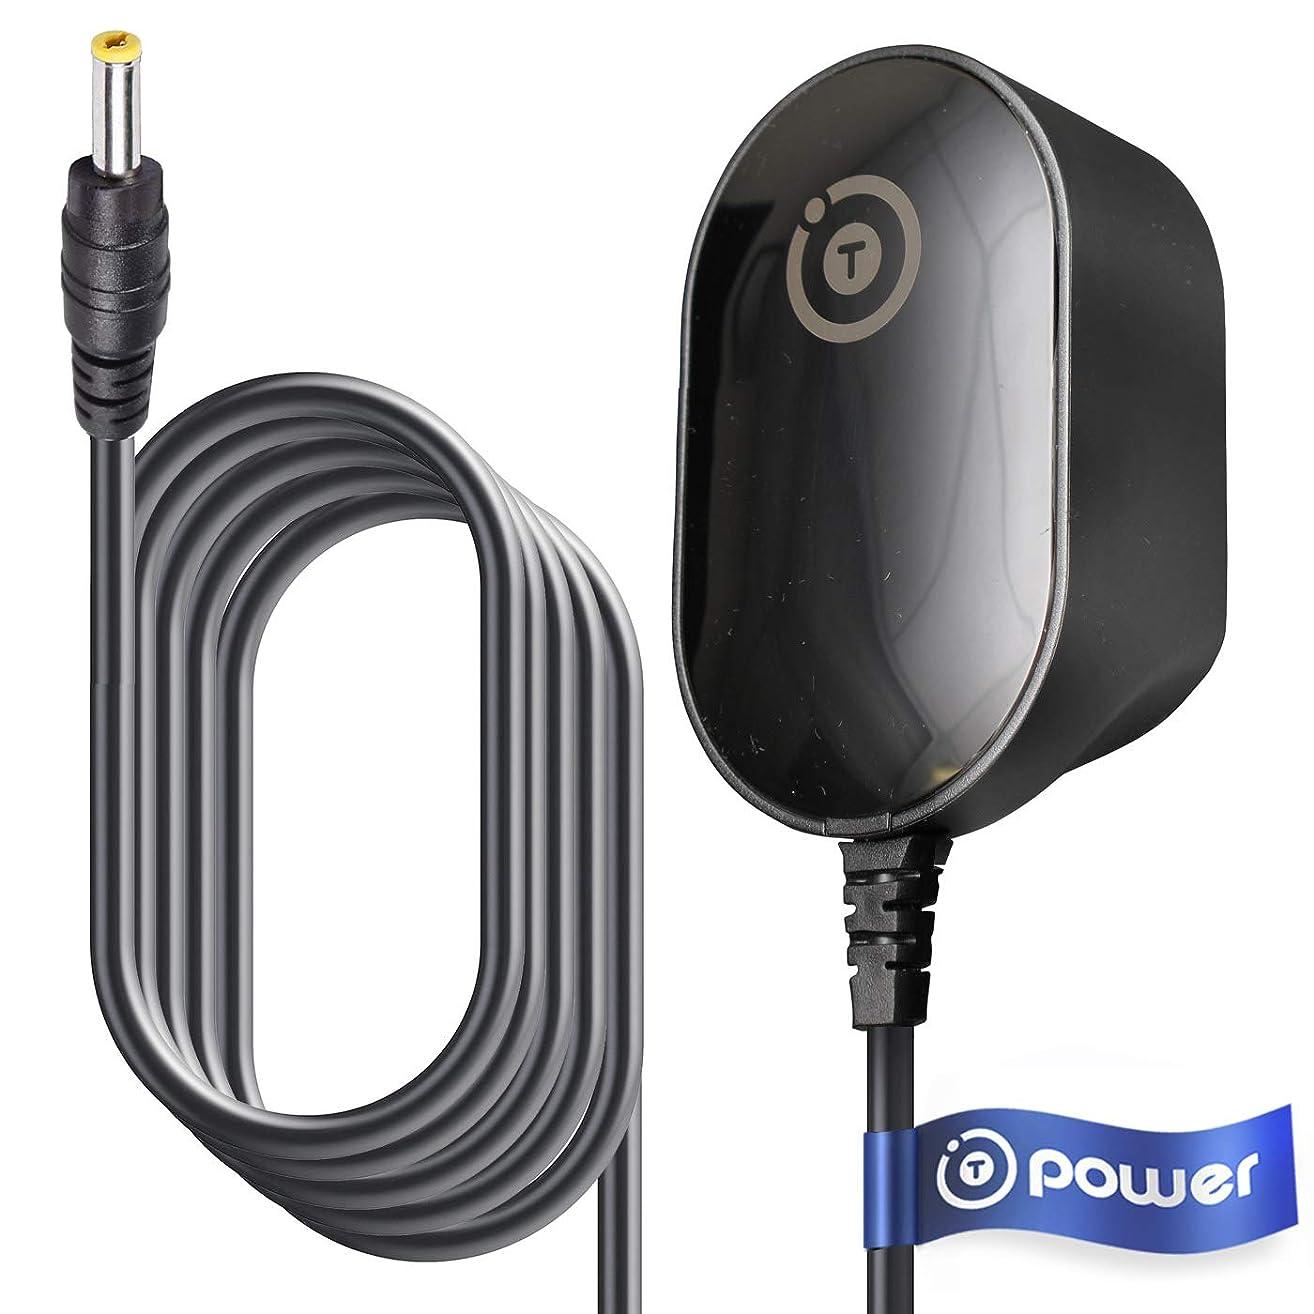 T POWER ( 6.6ft Cable ) Ac Dc Adapter Charger Compatible with Omron-Power-Supply 5 7 10 Series, 10 Series+ BP742N BP760N BP761 BP785 BP785N BP786N Upper Arm Blood Pressure Monitor